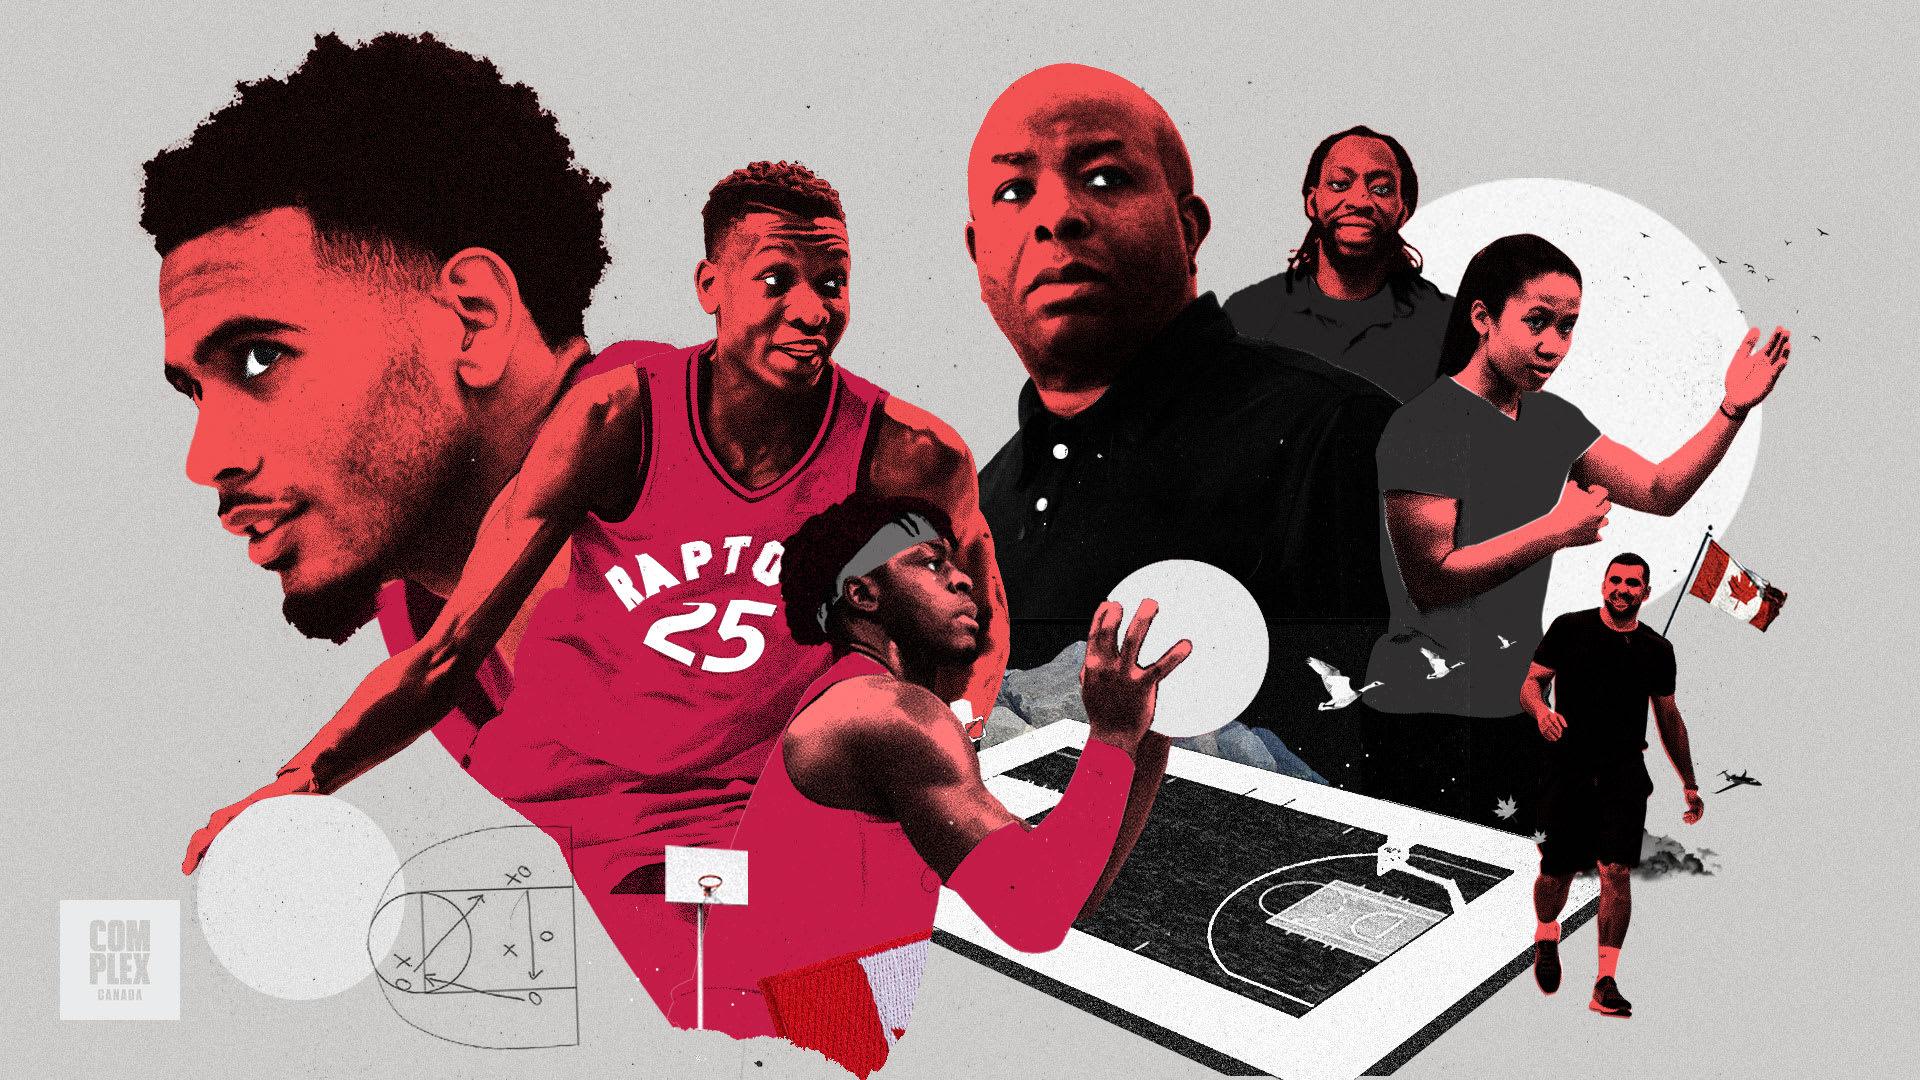 canada-youth-basketball-revolution-chris-boucher-shemar-rathan-mayes